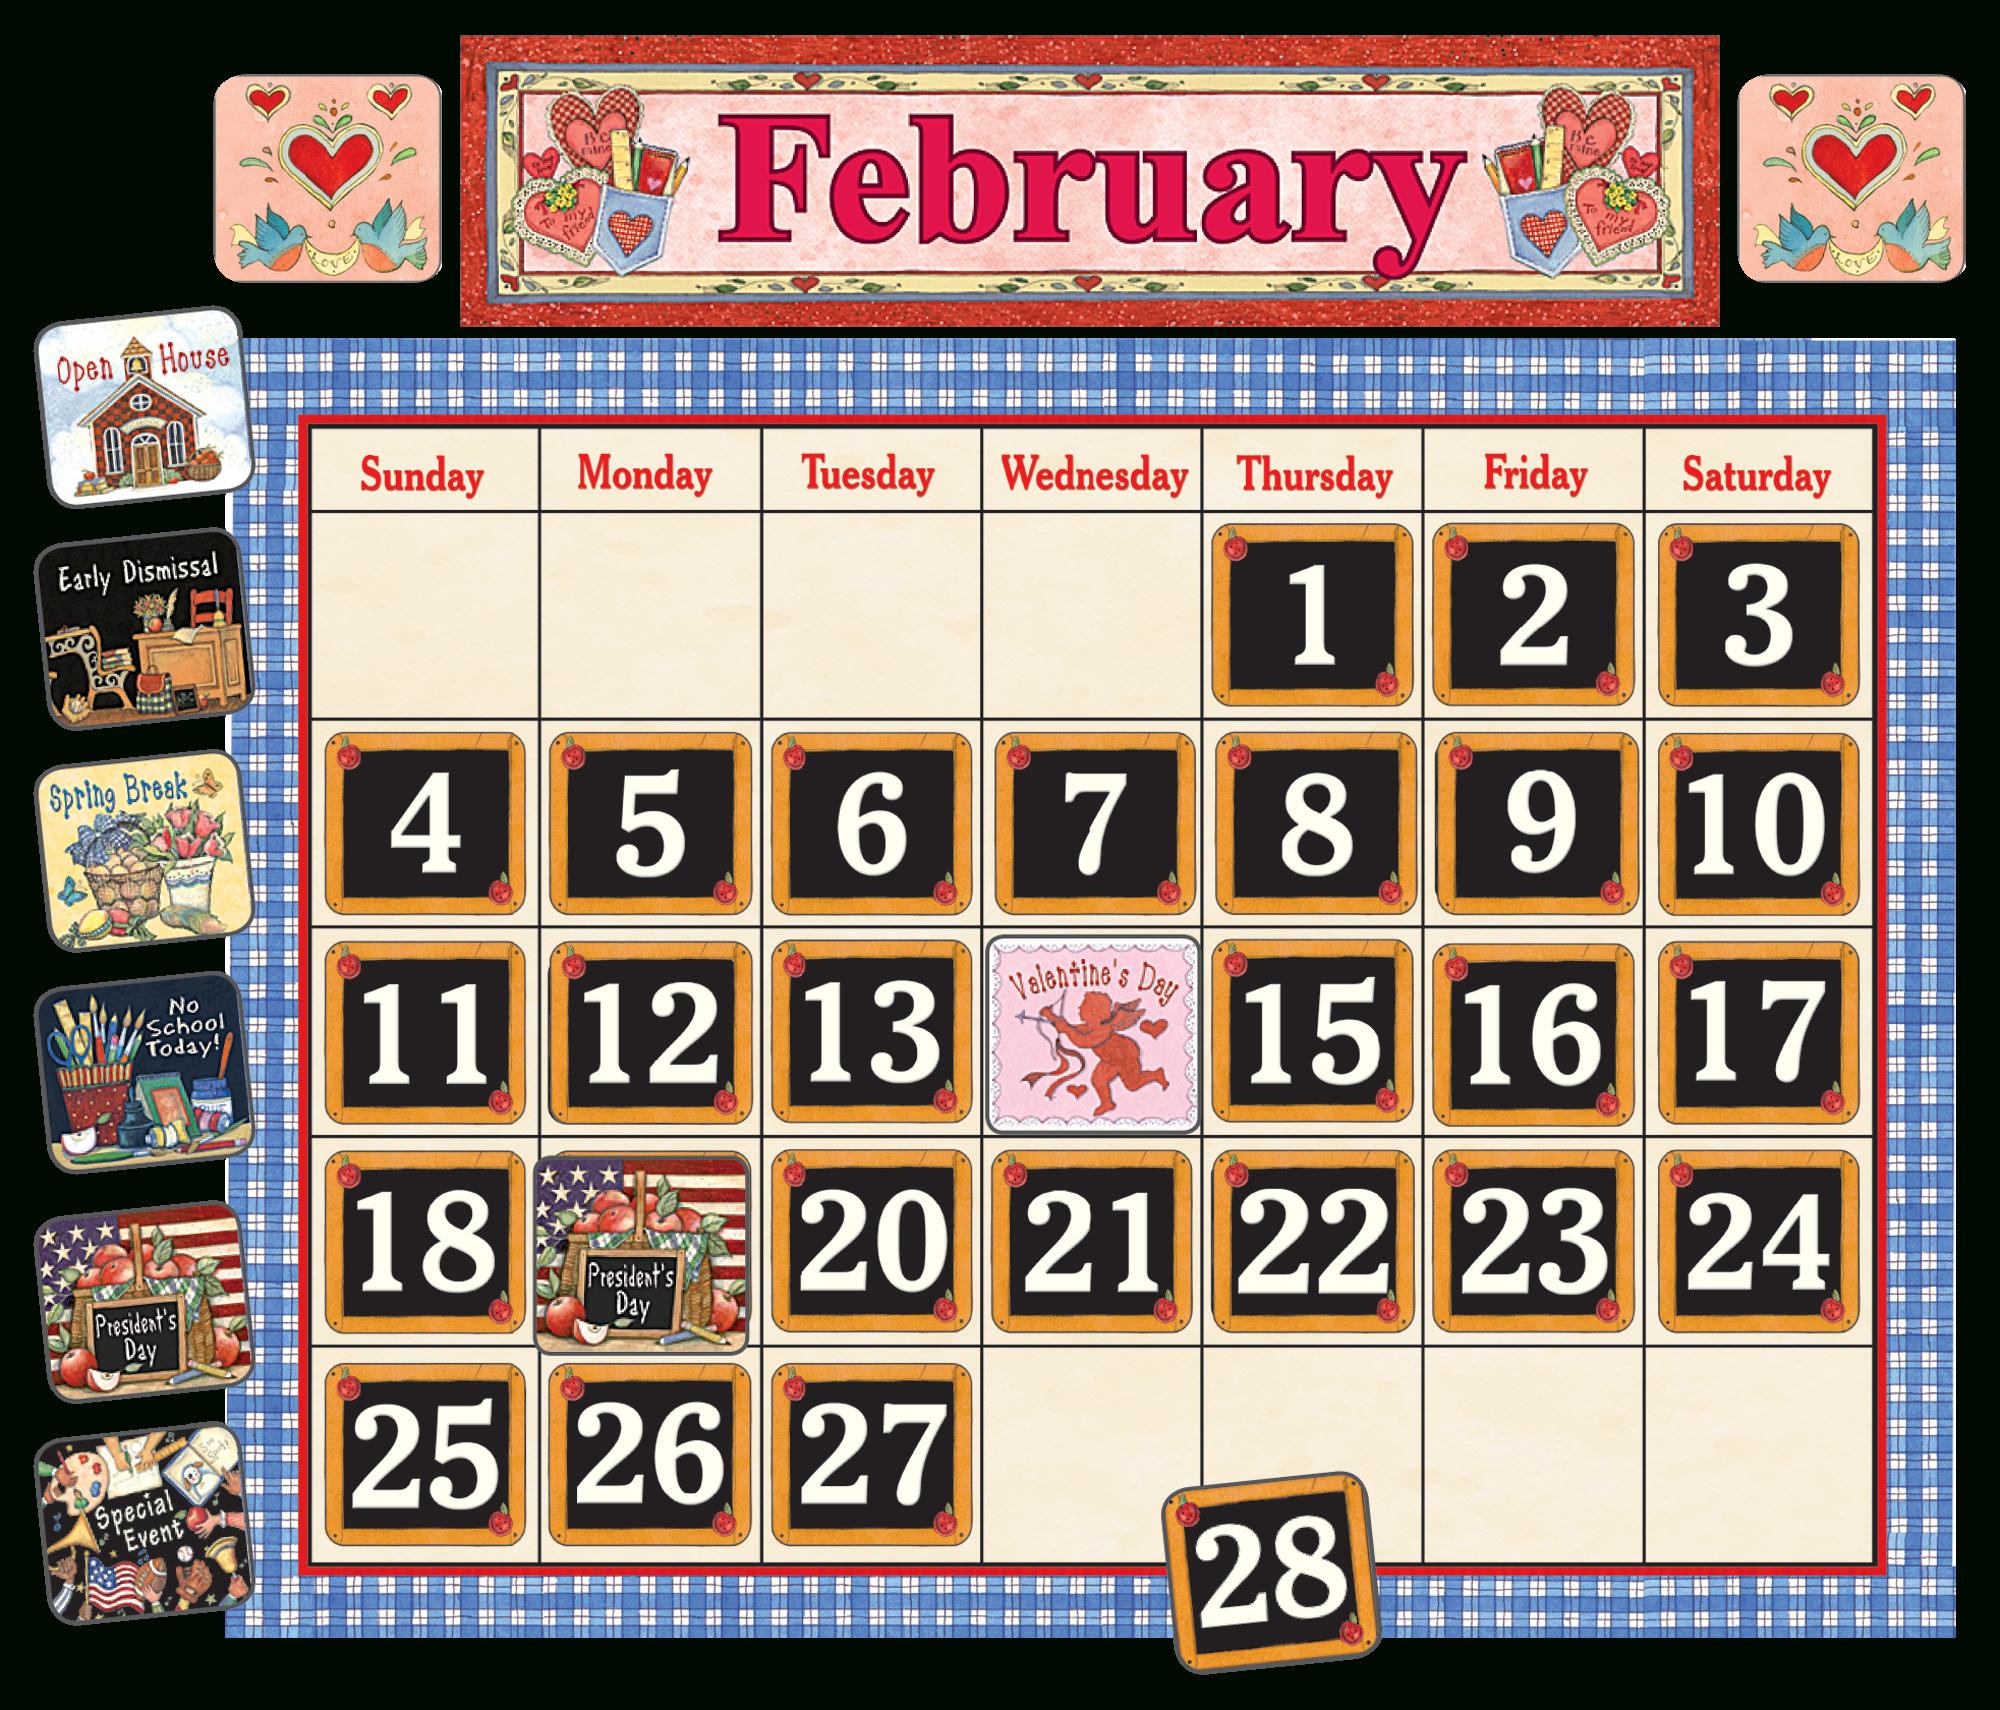 School Time Calendar Bulletin Board From Susan Winget